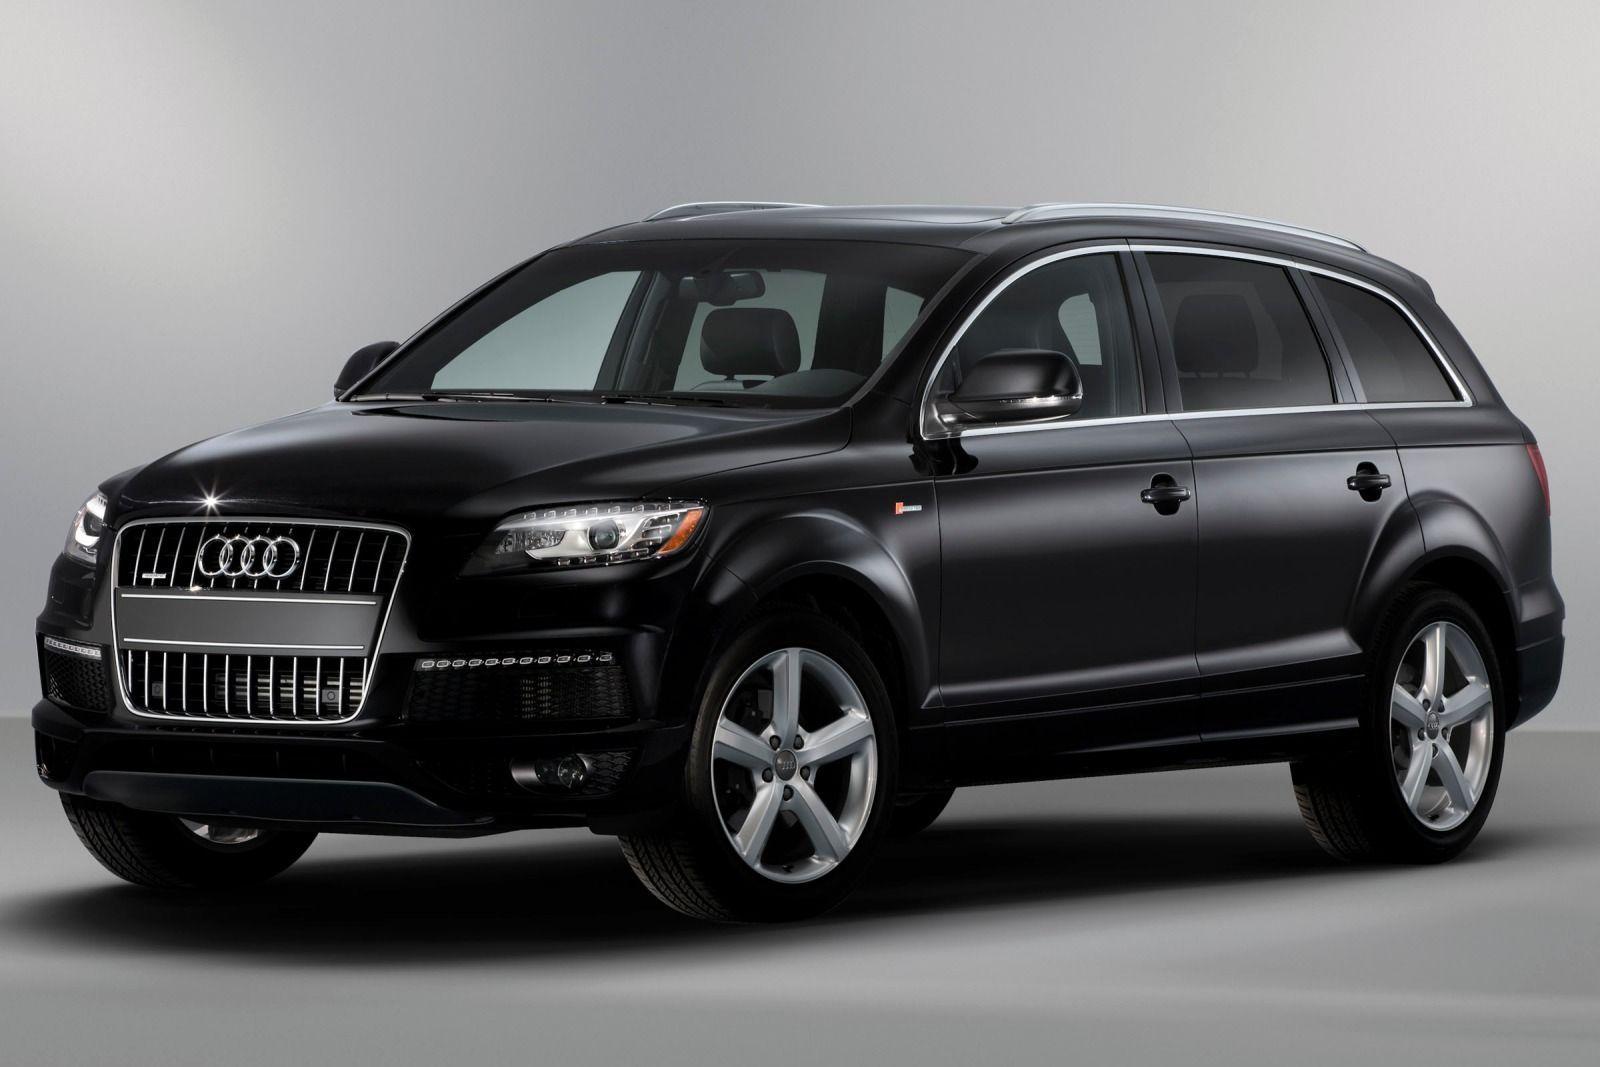 Cool Audi Suv 2016 Price Audi q7, Audi, Audi suv